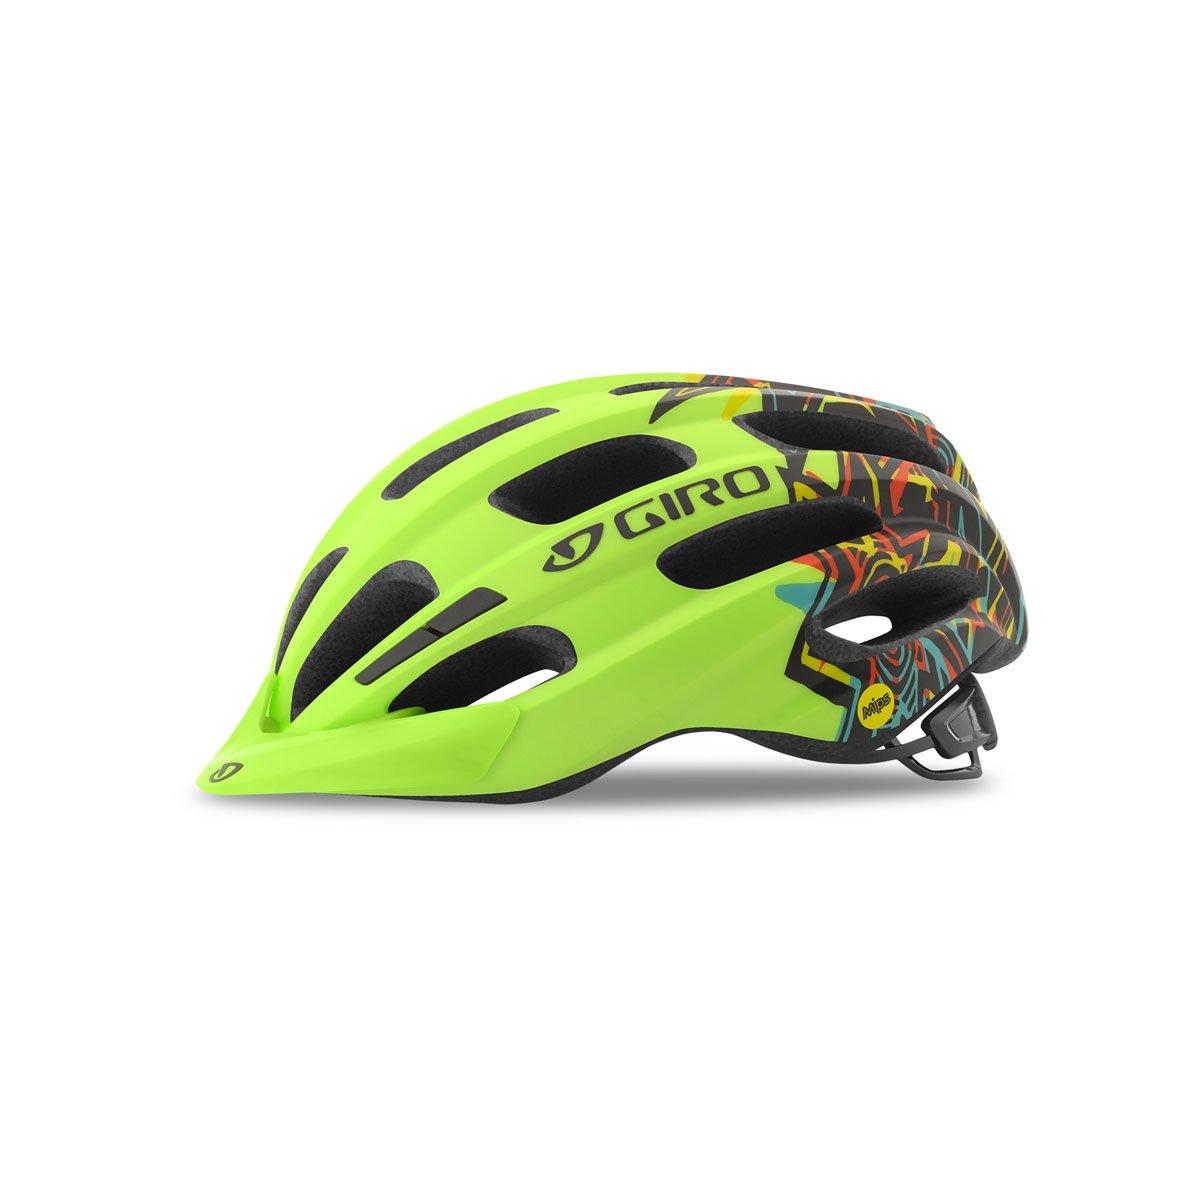 Giro Hale MIPS – Youth Bike Helmet